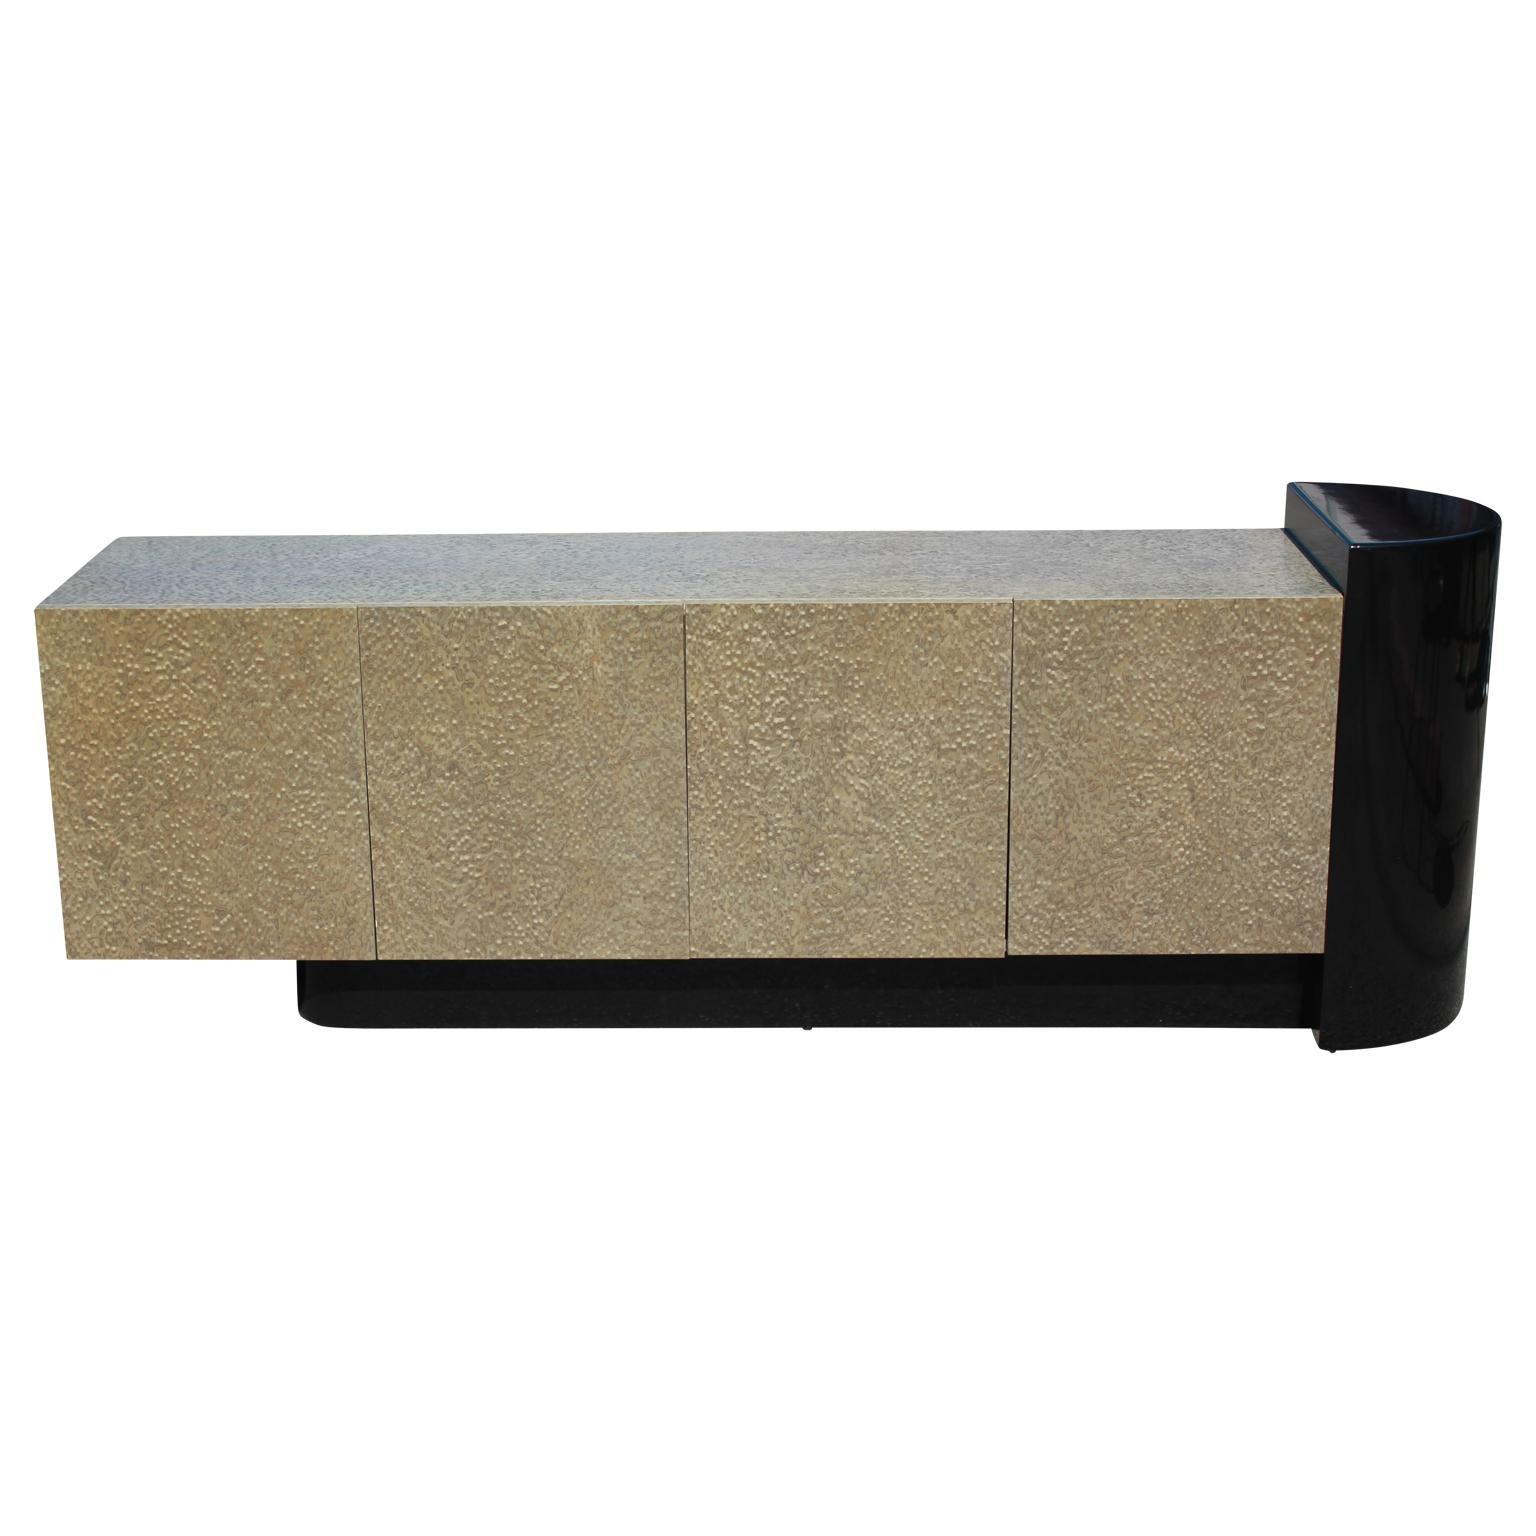 Postmodern Asymmetrical Cantilevered Two-Tone Burl Veneer Sideboard or Credenza